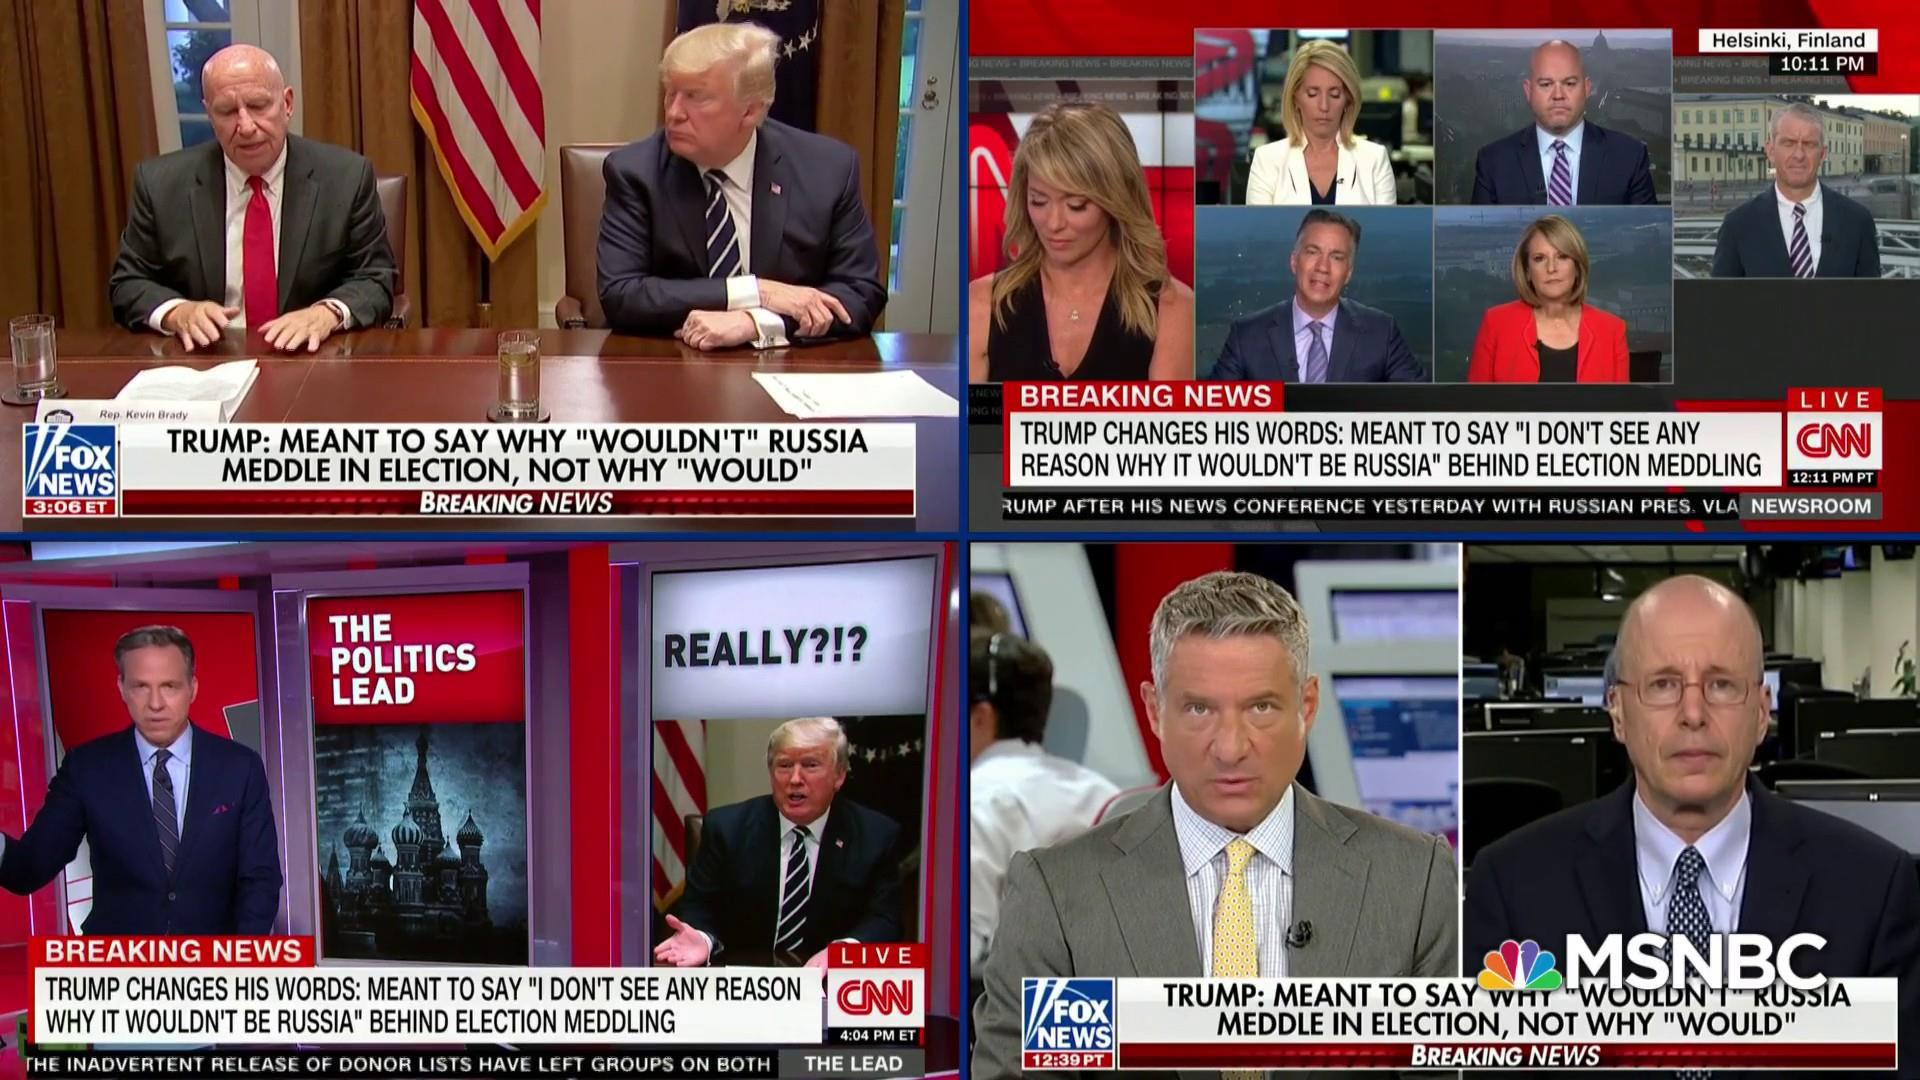 Fox News defends Trump's Russian media gaffe after criticizing it